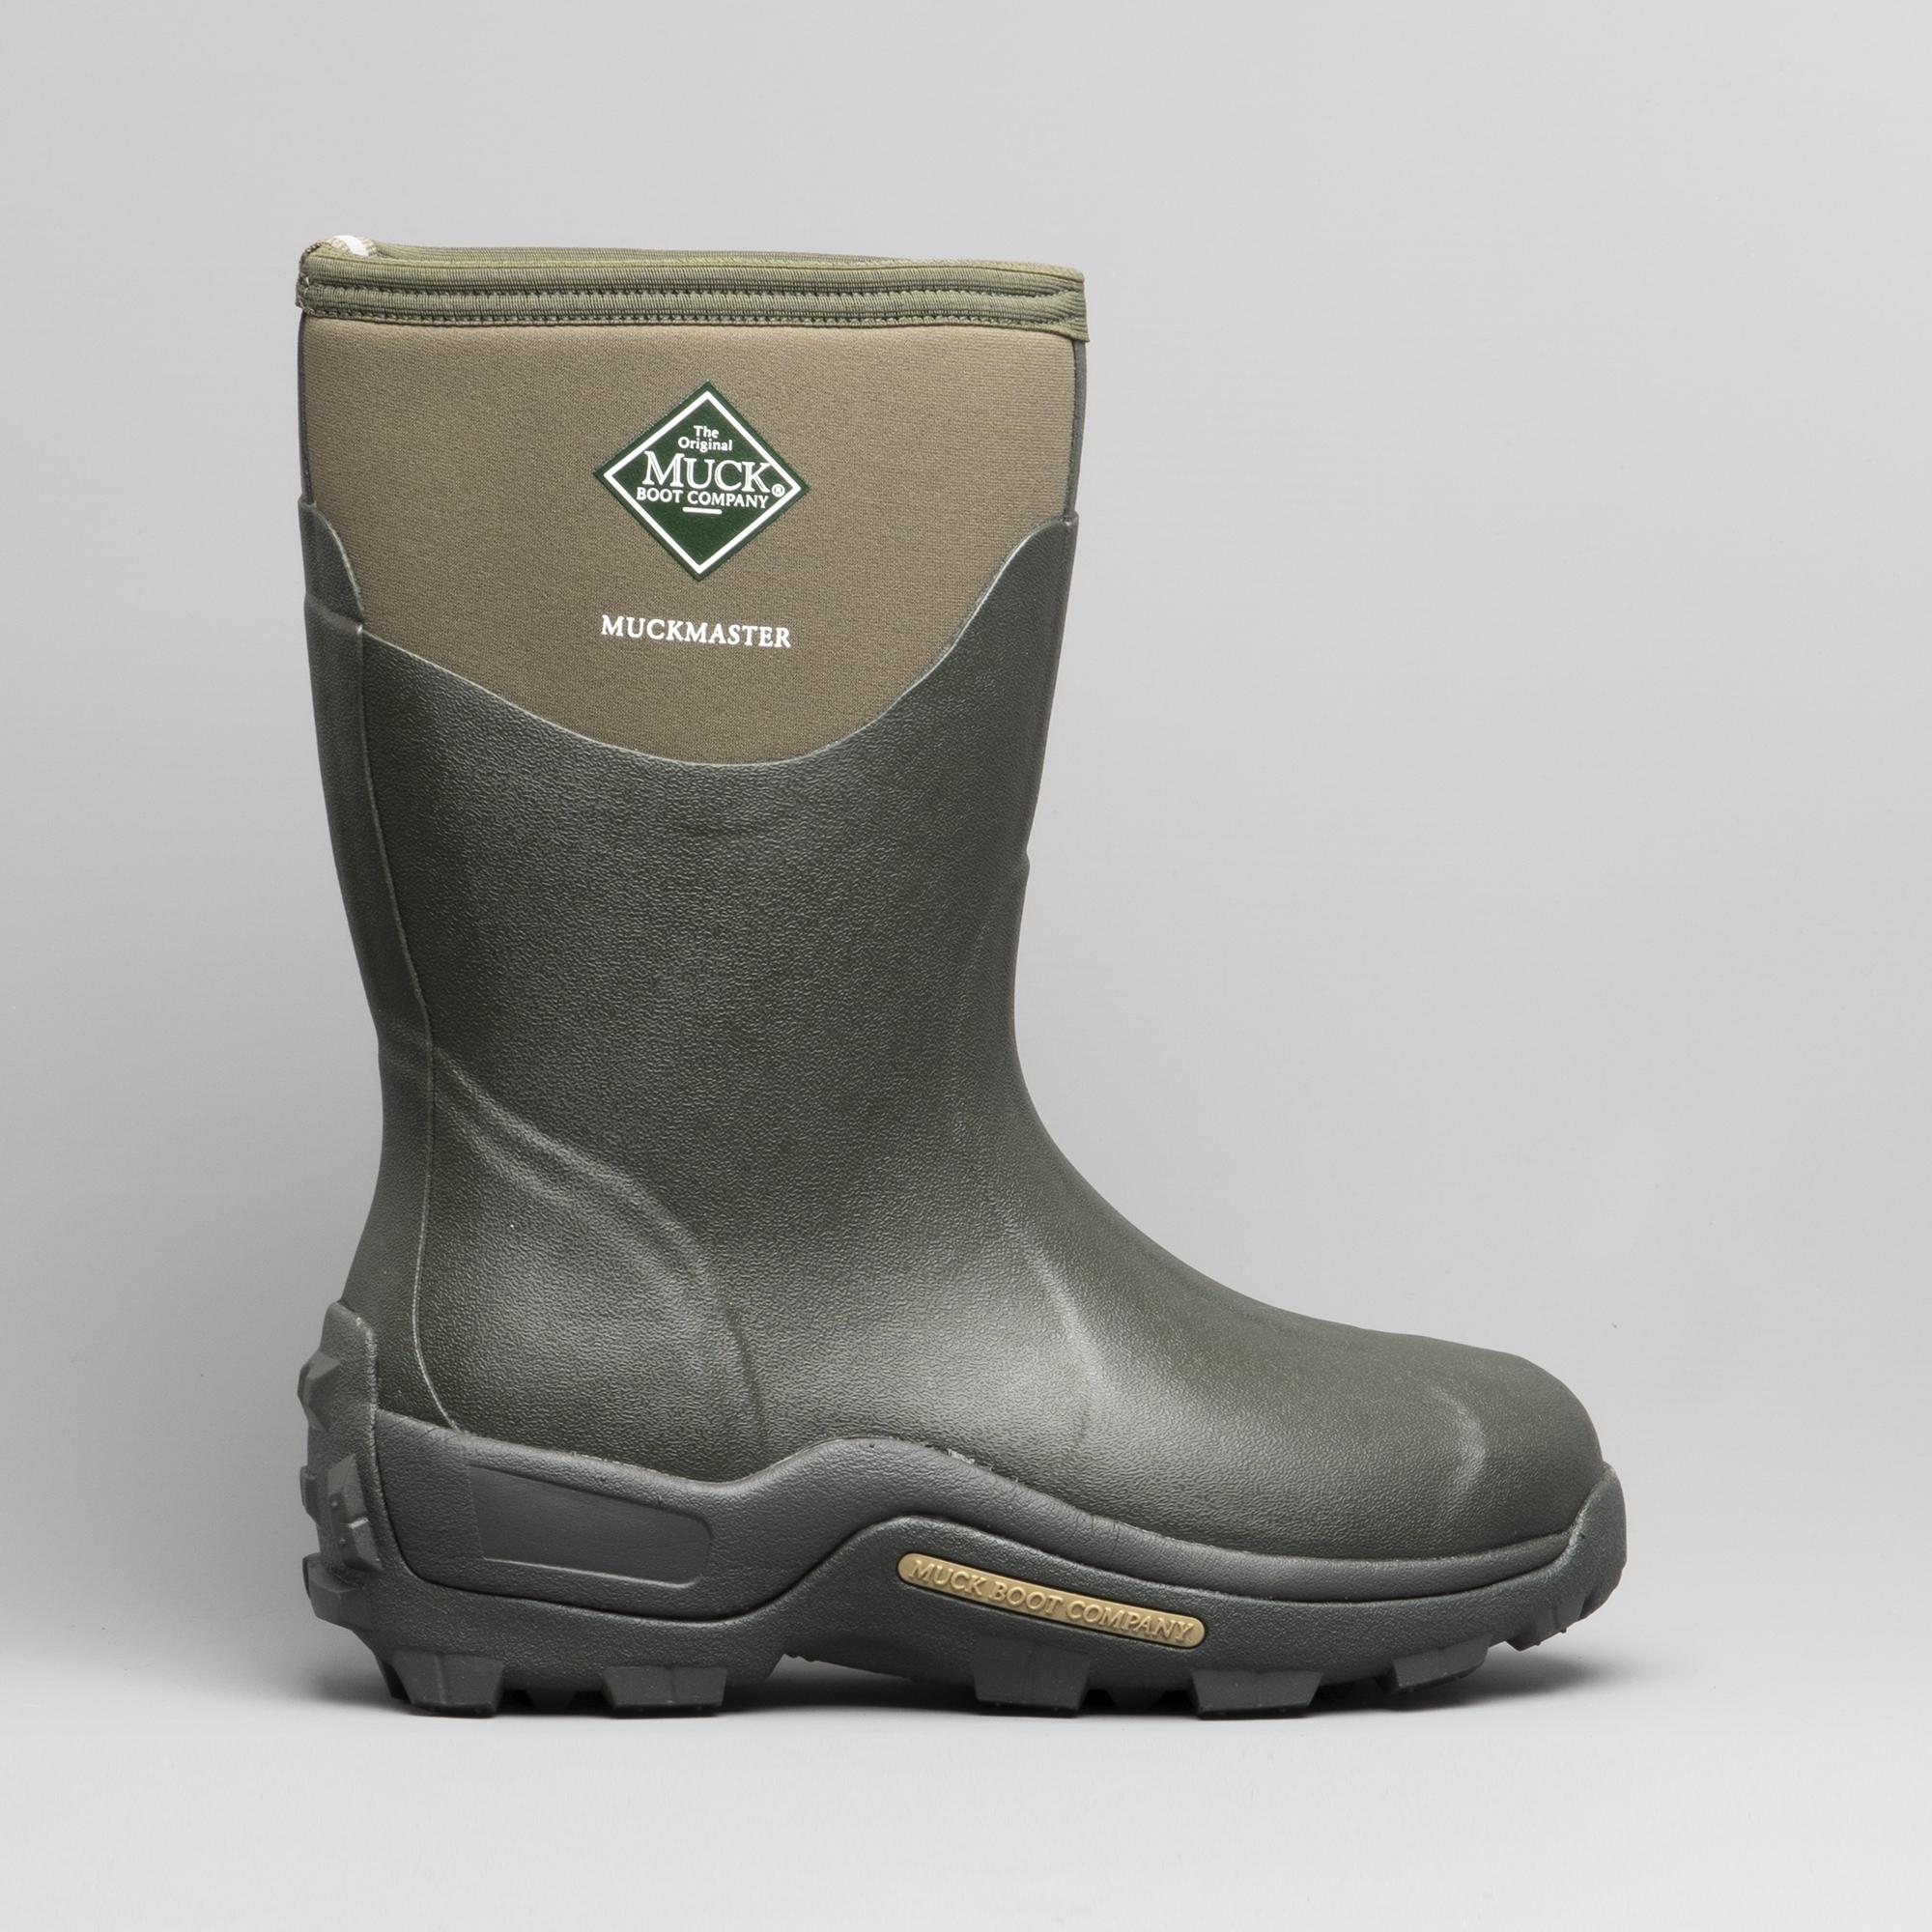 843ac14e562 Muck Boots MUCKMASTER MID Unisex Wellington Boots Moss